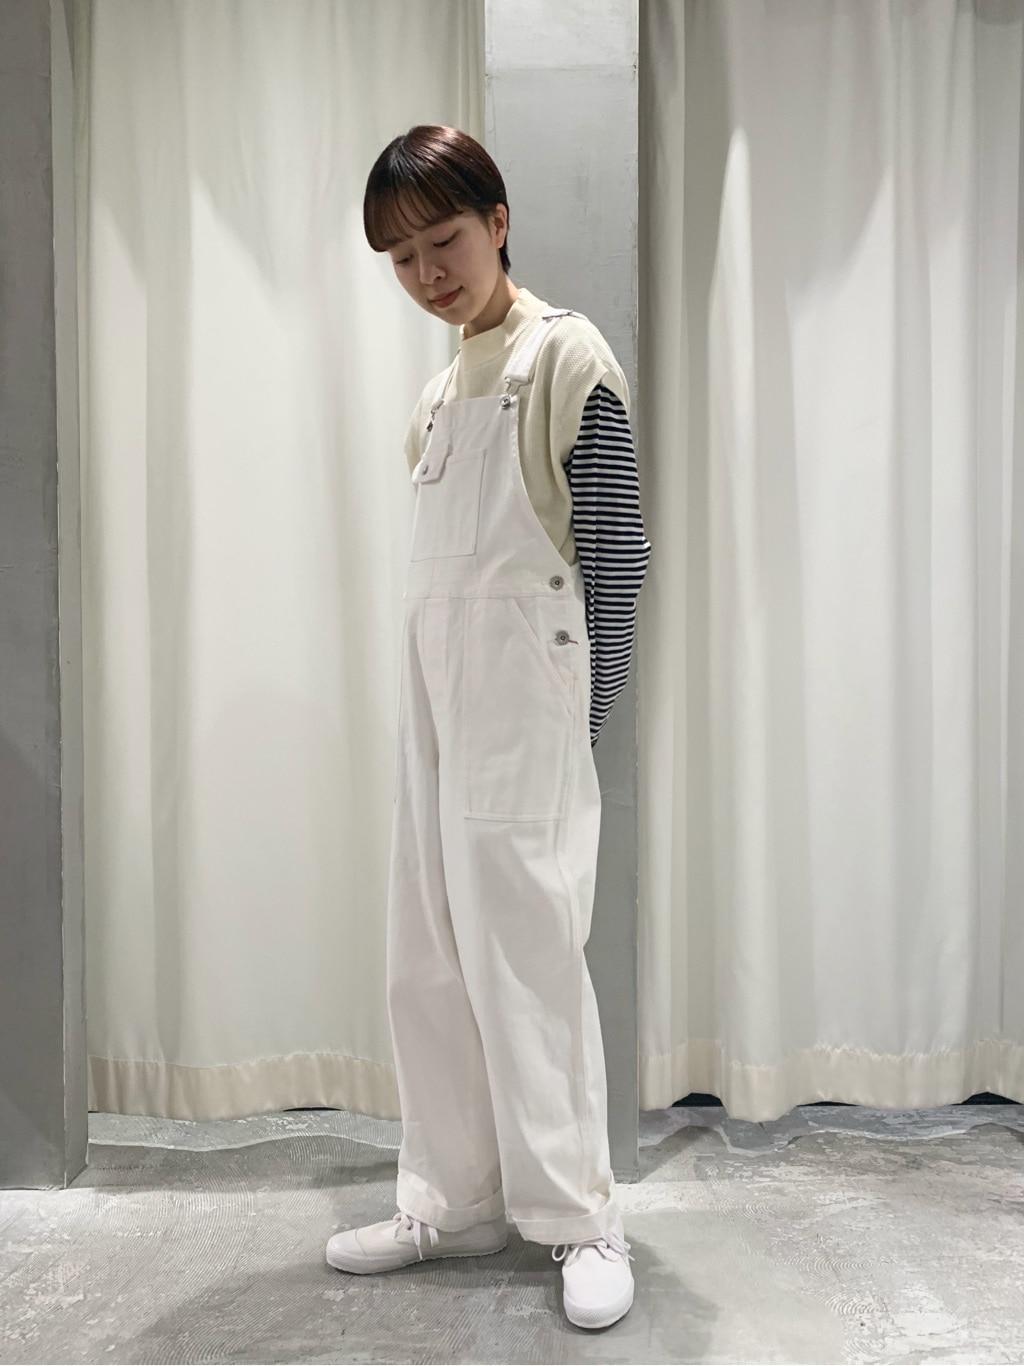 - CHILD WOMAN CHILD WOMAN , PAR ICI ルミネ横浜 身長:158cm 2021.03.17